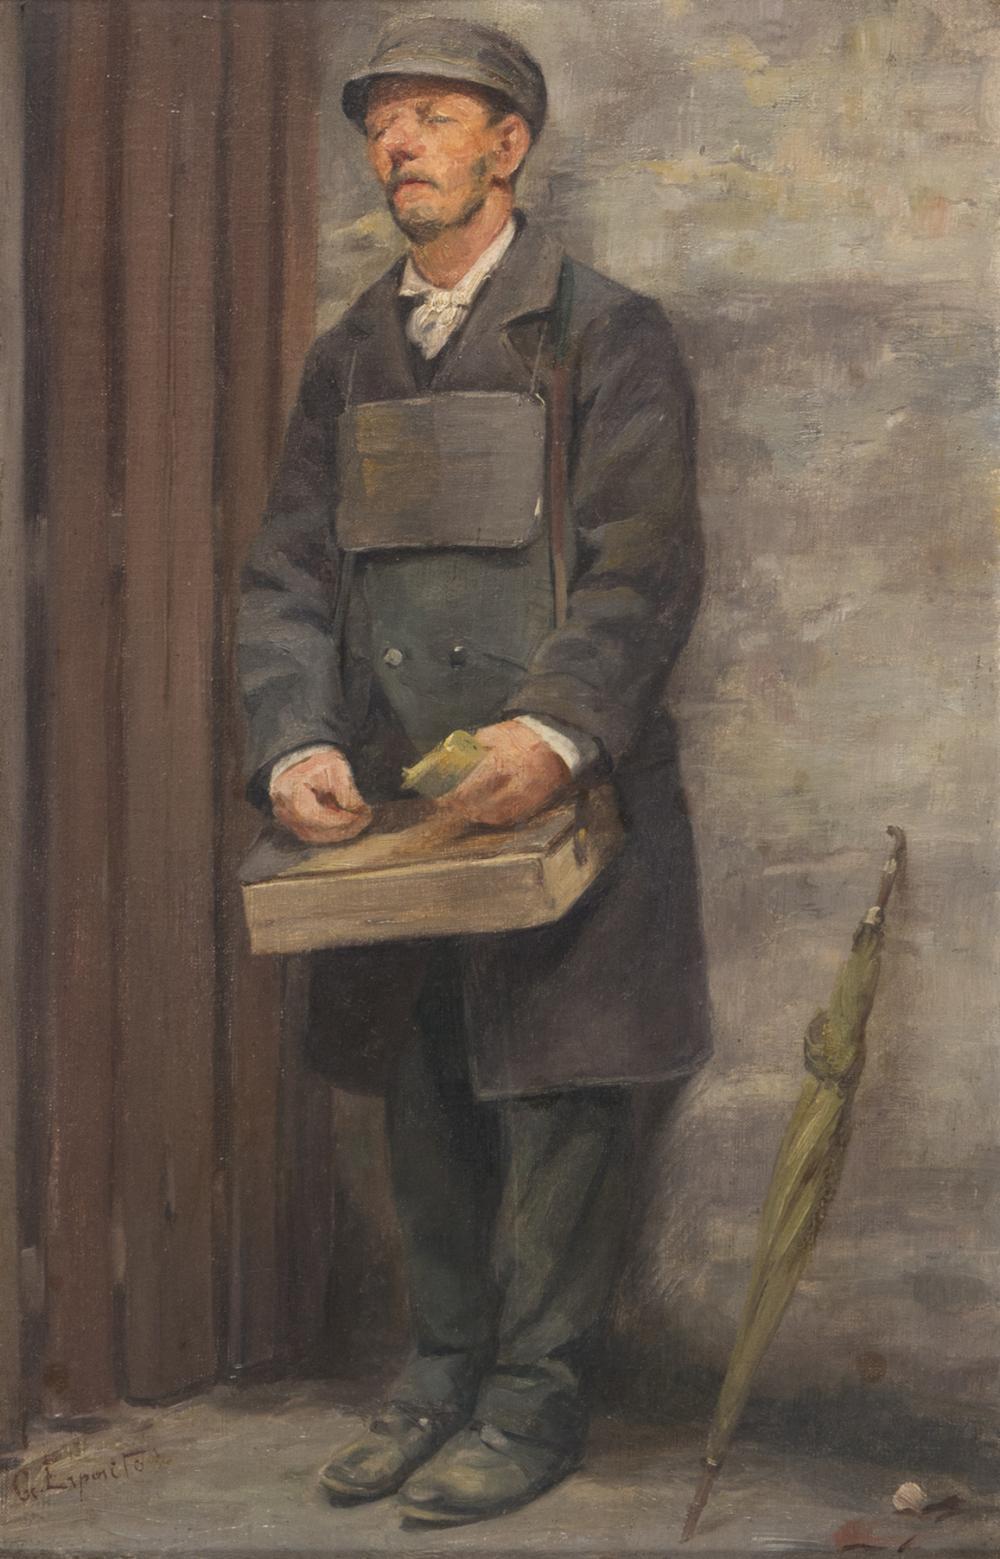 NEAPOLITAN PAINTER, 19TH CENTURY